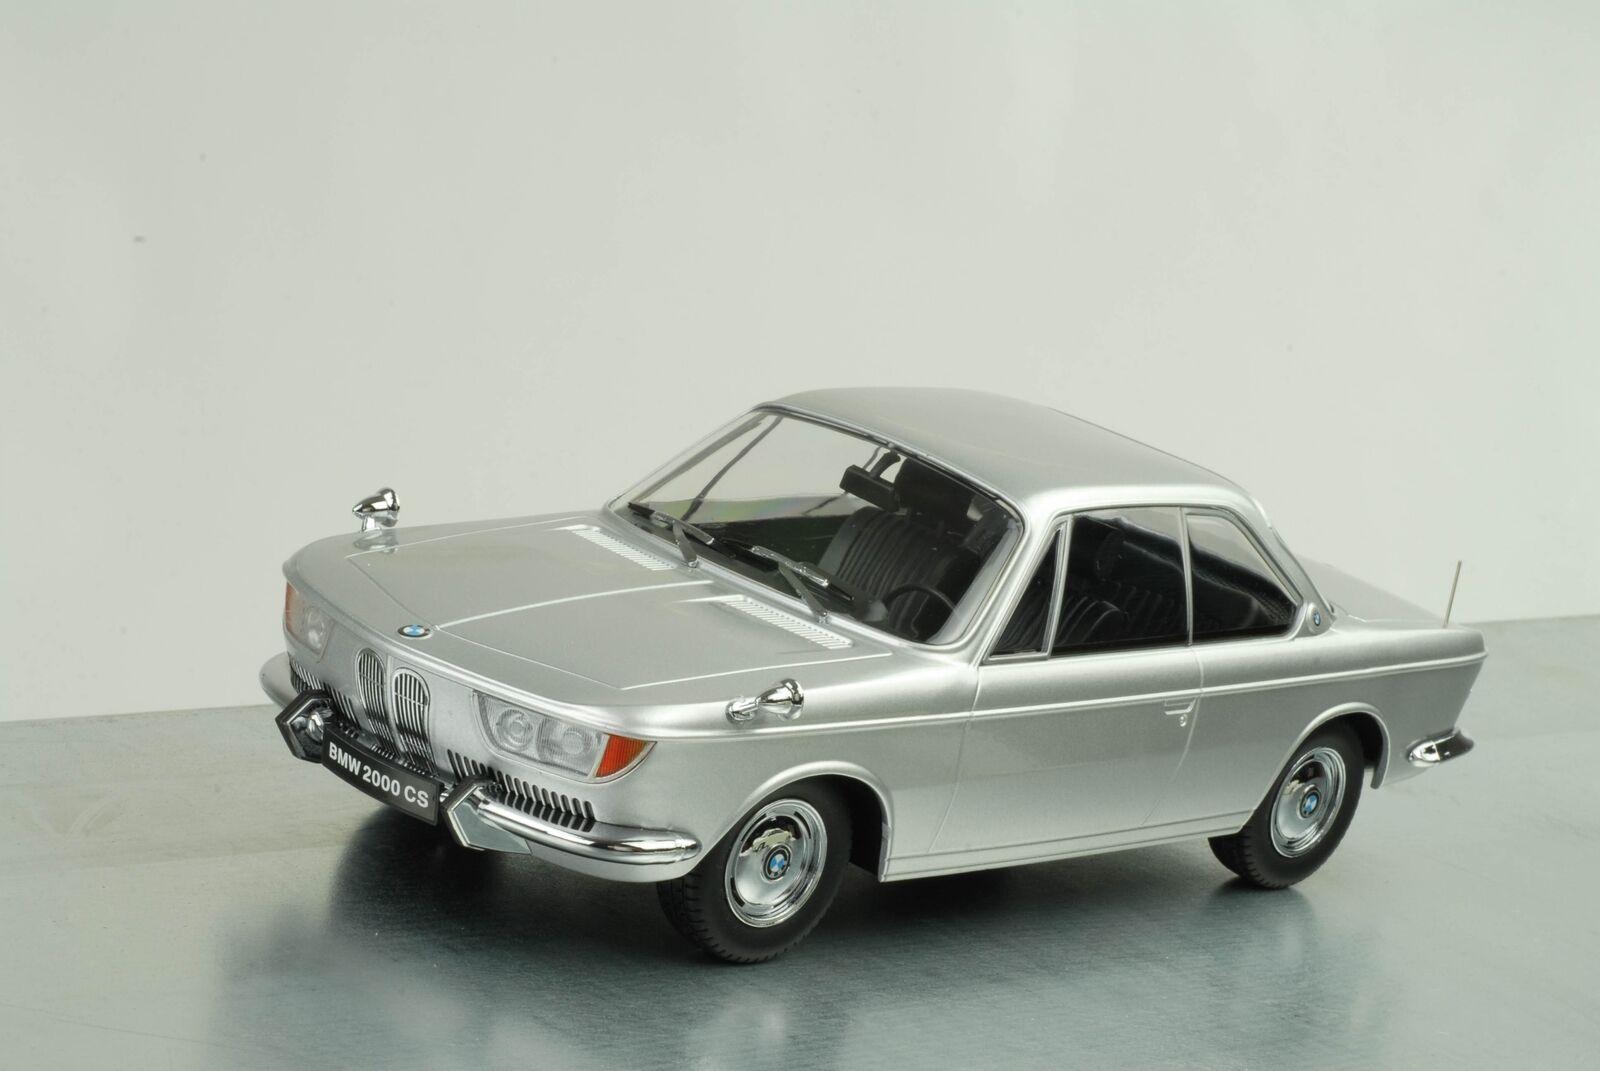 BMW 2000 Cs Coupe 1965 to 1970 Karmann Silver 1 18 Kk Scale Diecast